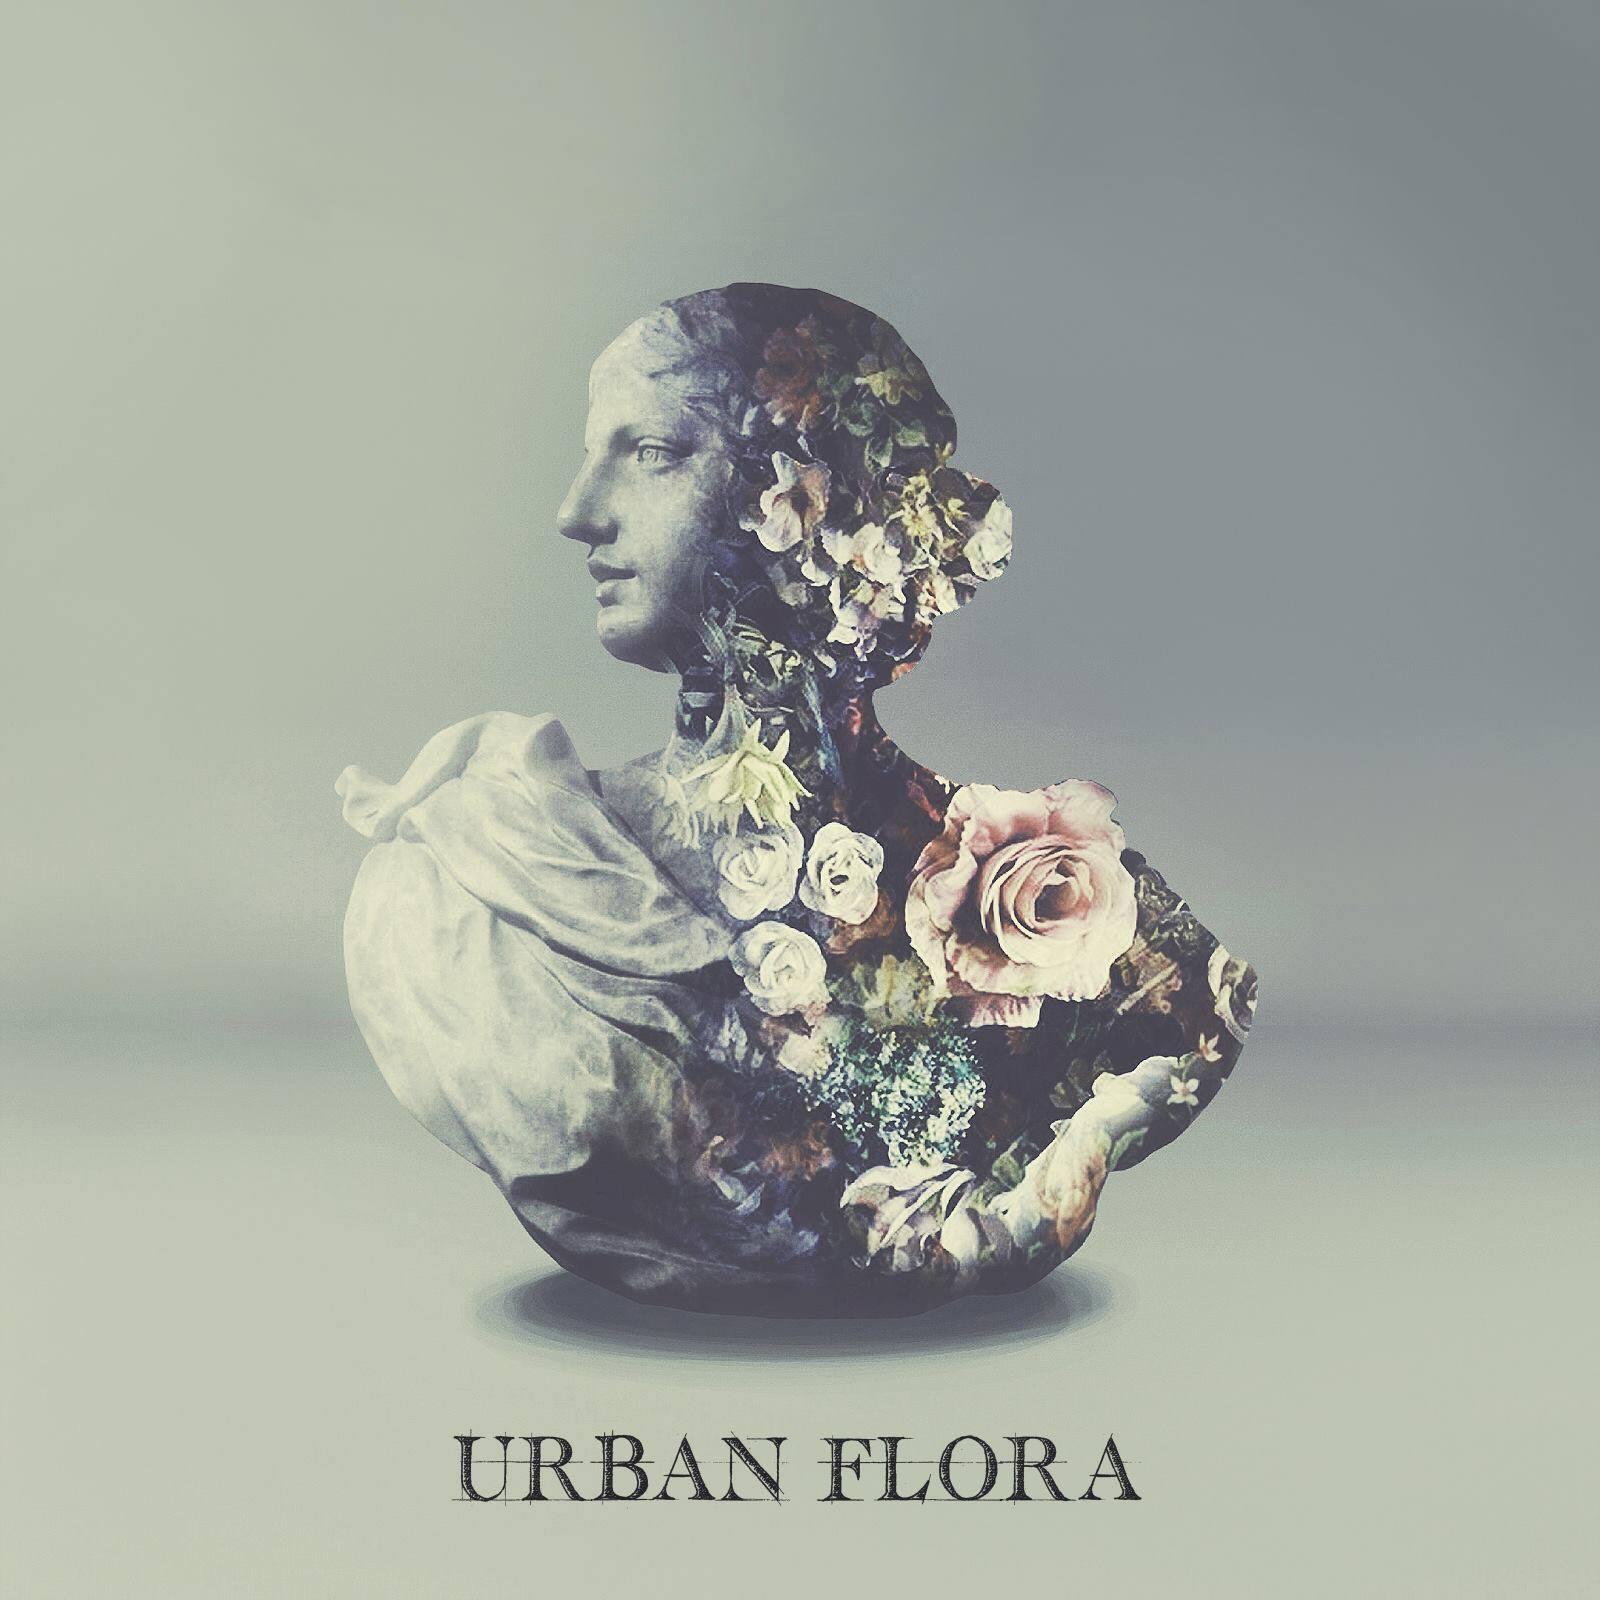 quality-linkage-urban-flora-alina-baraz-galimatias